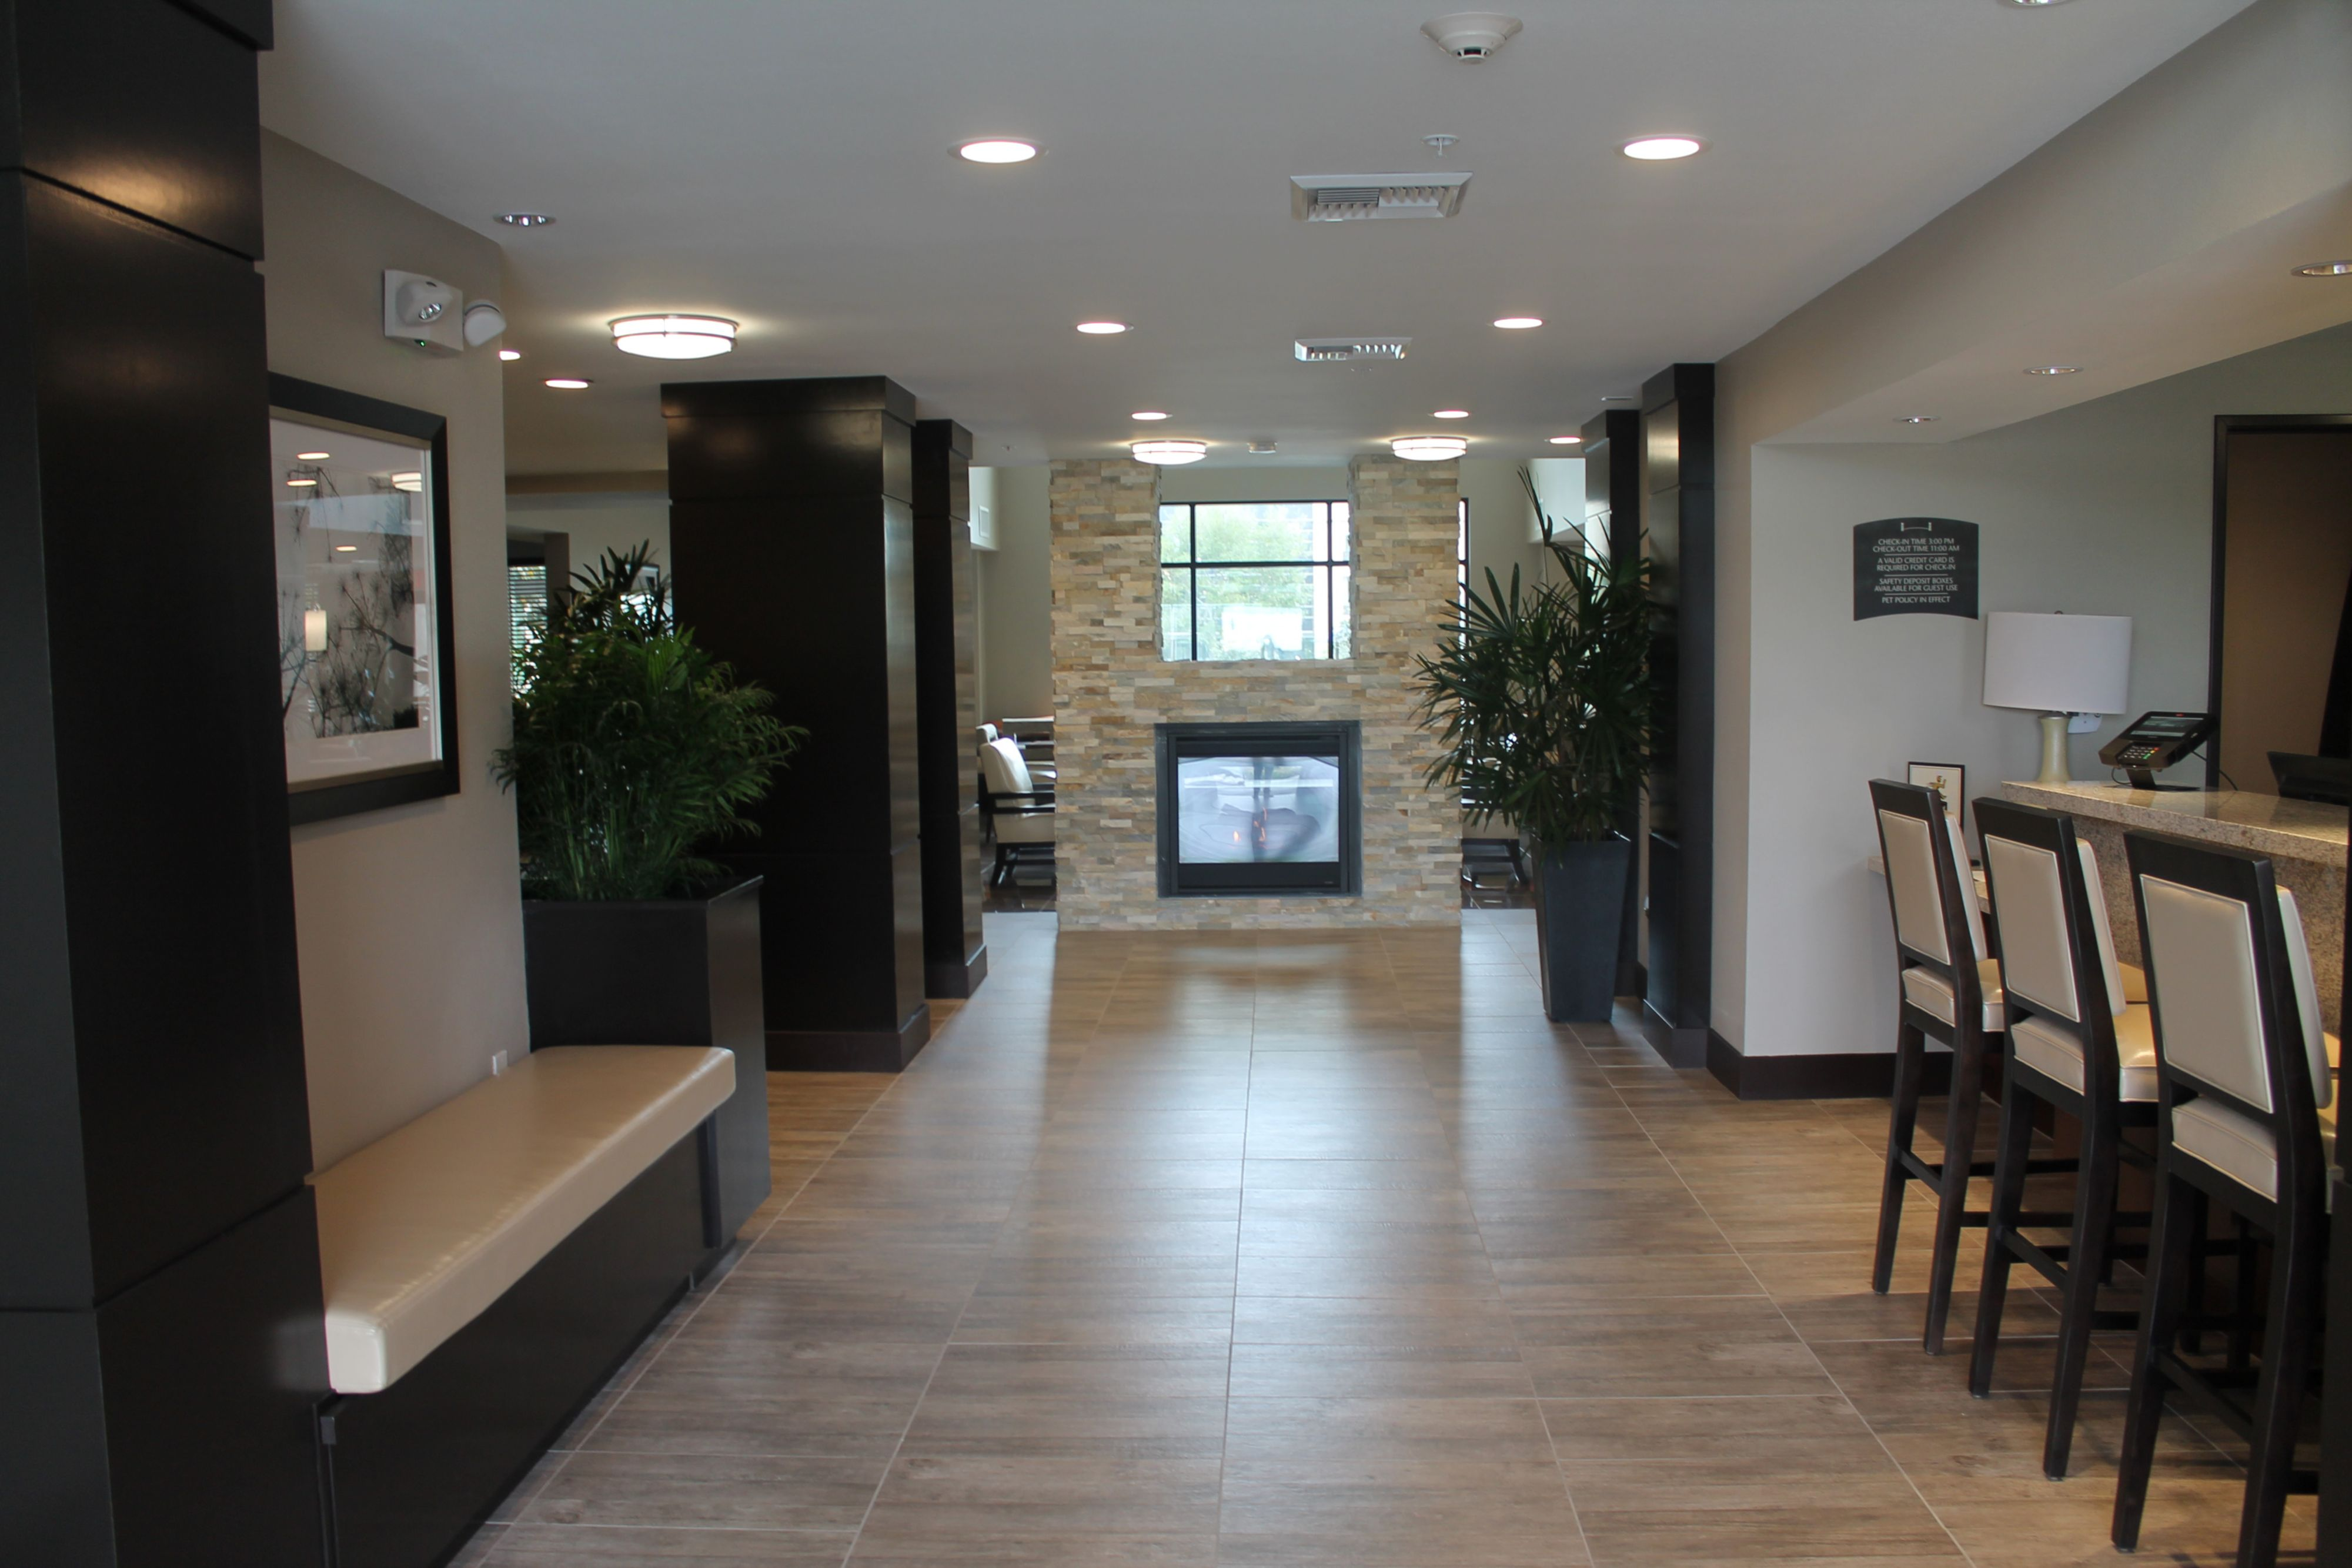 Staybridge Suites Carlsbad - San Diego image 4